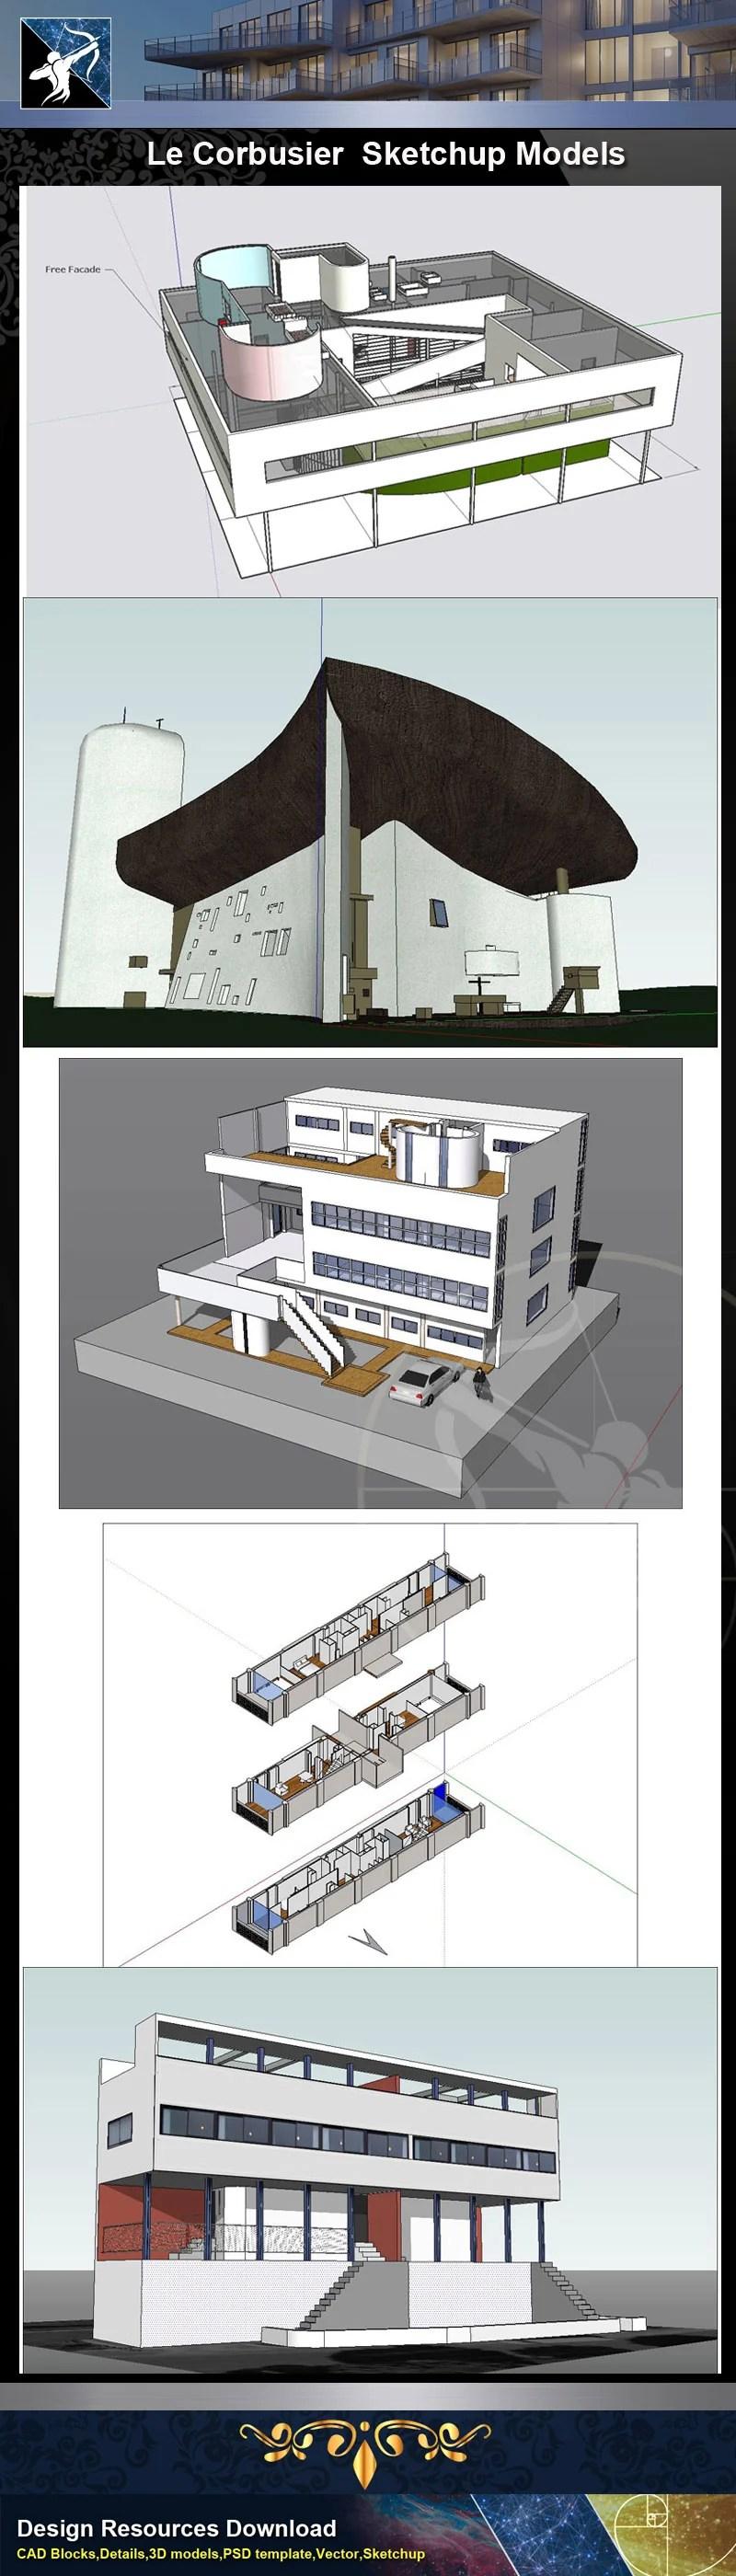 ★★Total 107 Pritzker Architecture Sketchup 3D Models★ (Best Recommanded!!)